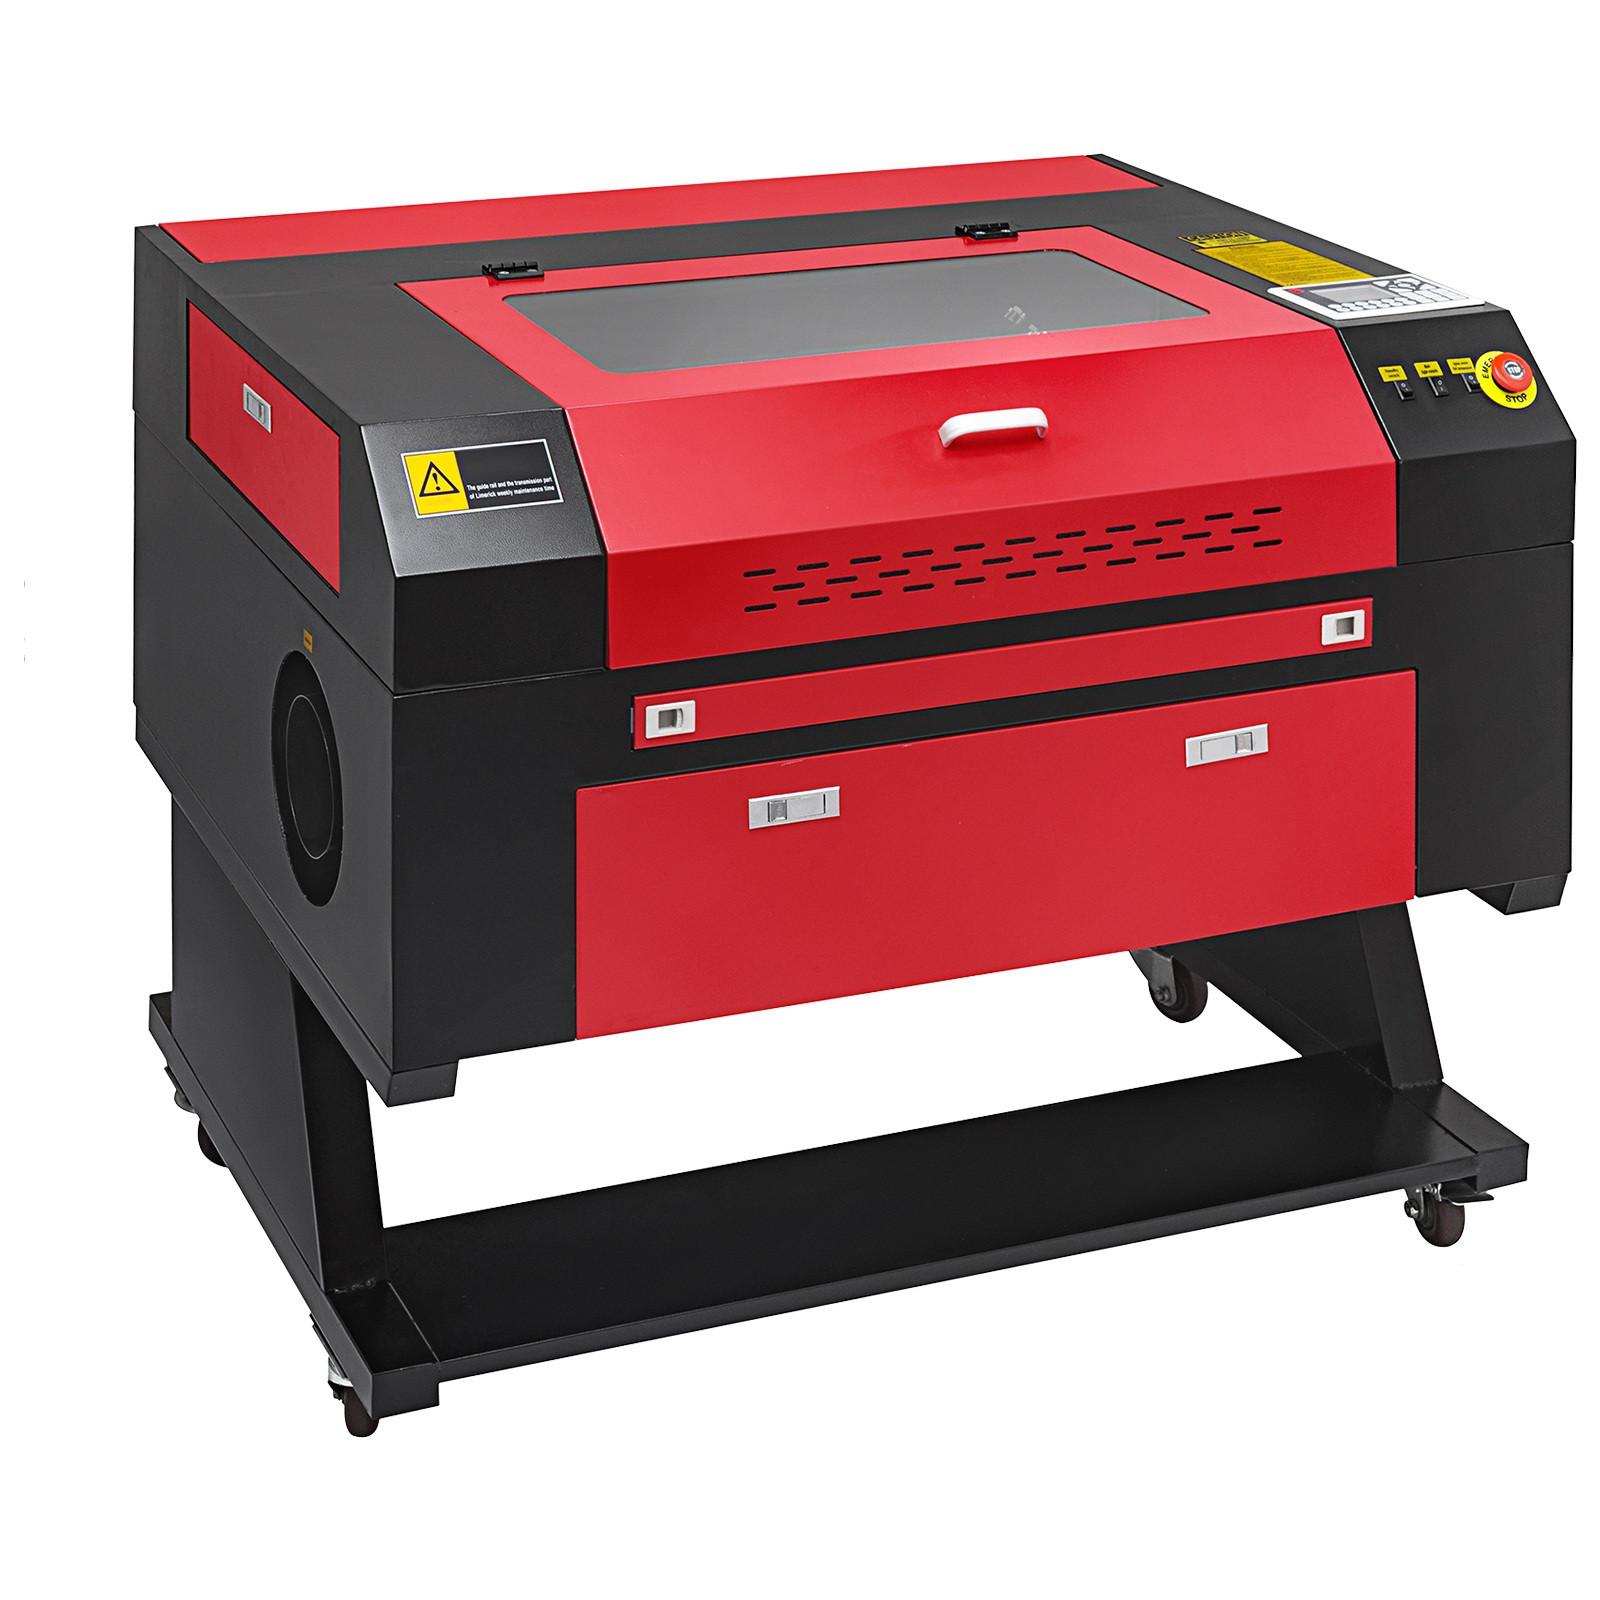 Macchina-per-Incisione-Laser-CO2-40-130W-Asse-Rotante-Tagliatrice-Incisore miniatura 49